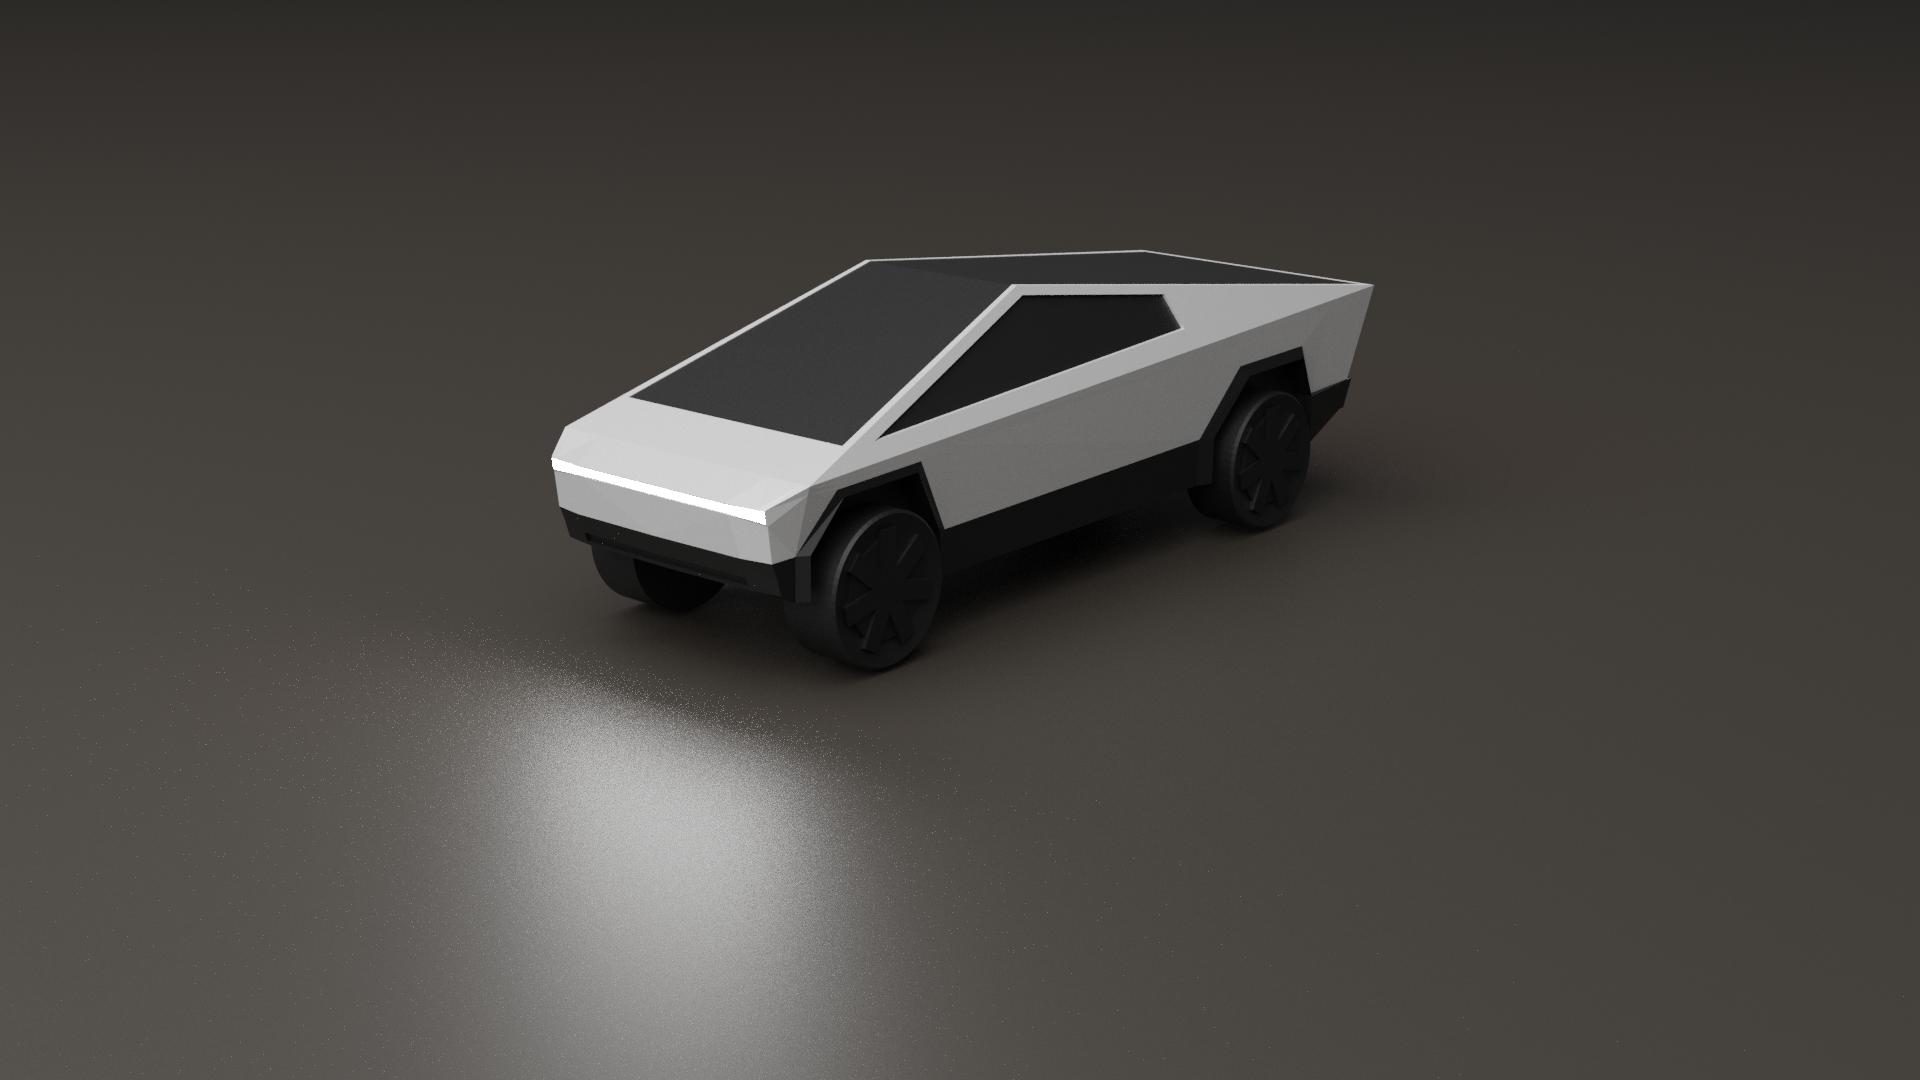 cybrtrkrender1.png Download free STL file Tesla Cybertruck • 3D printer template, auralgasm